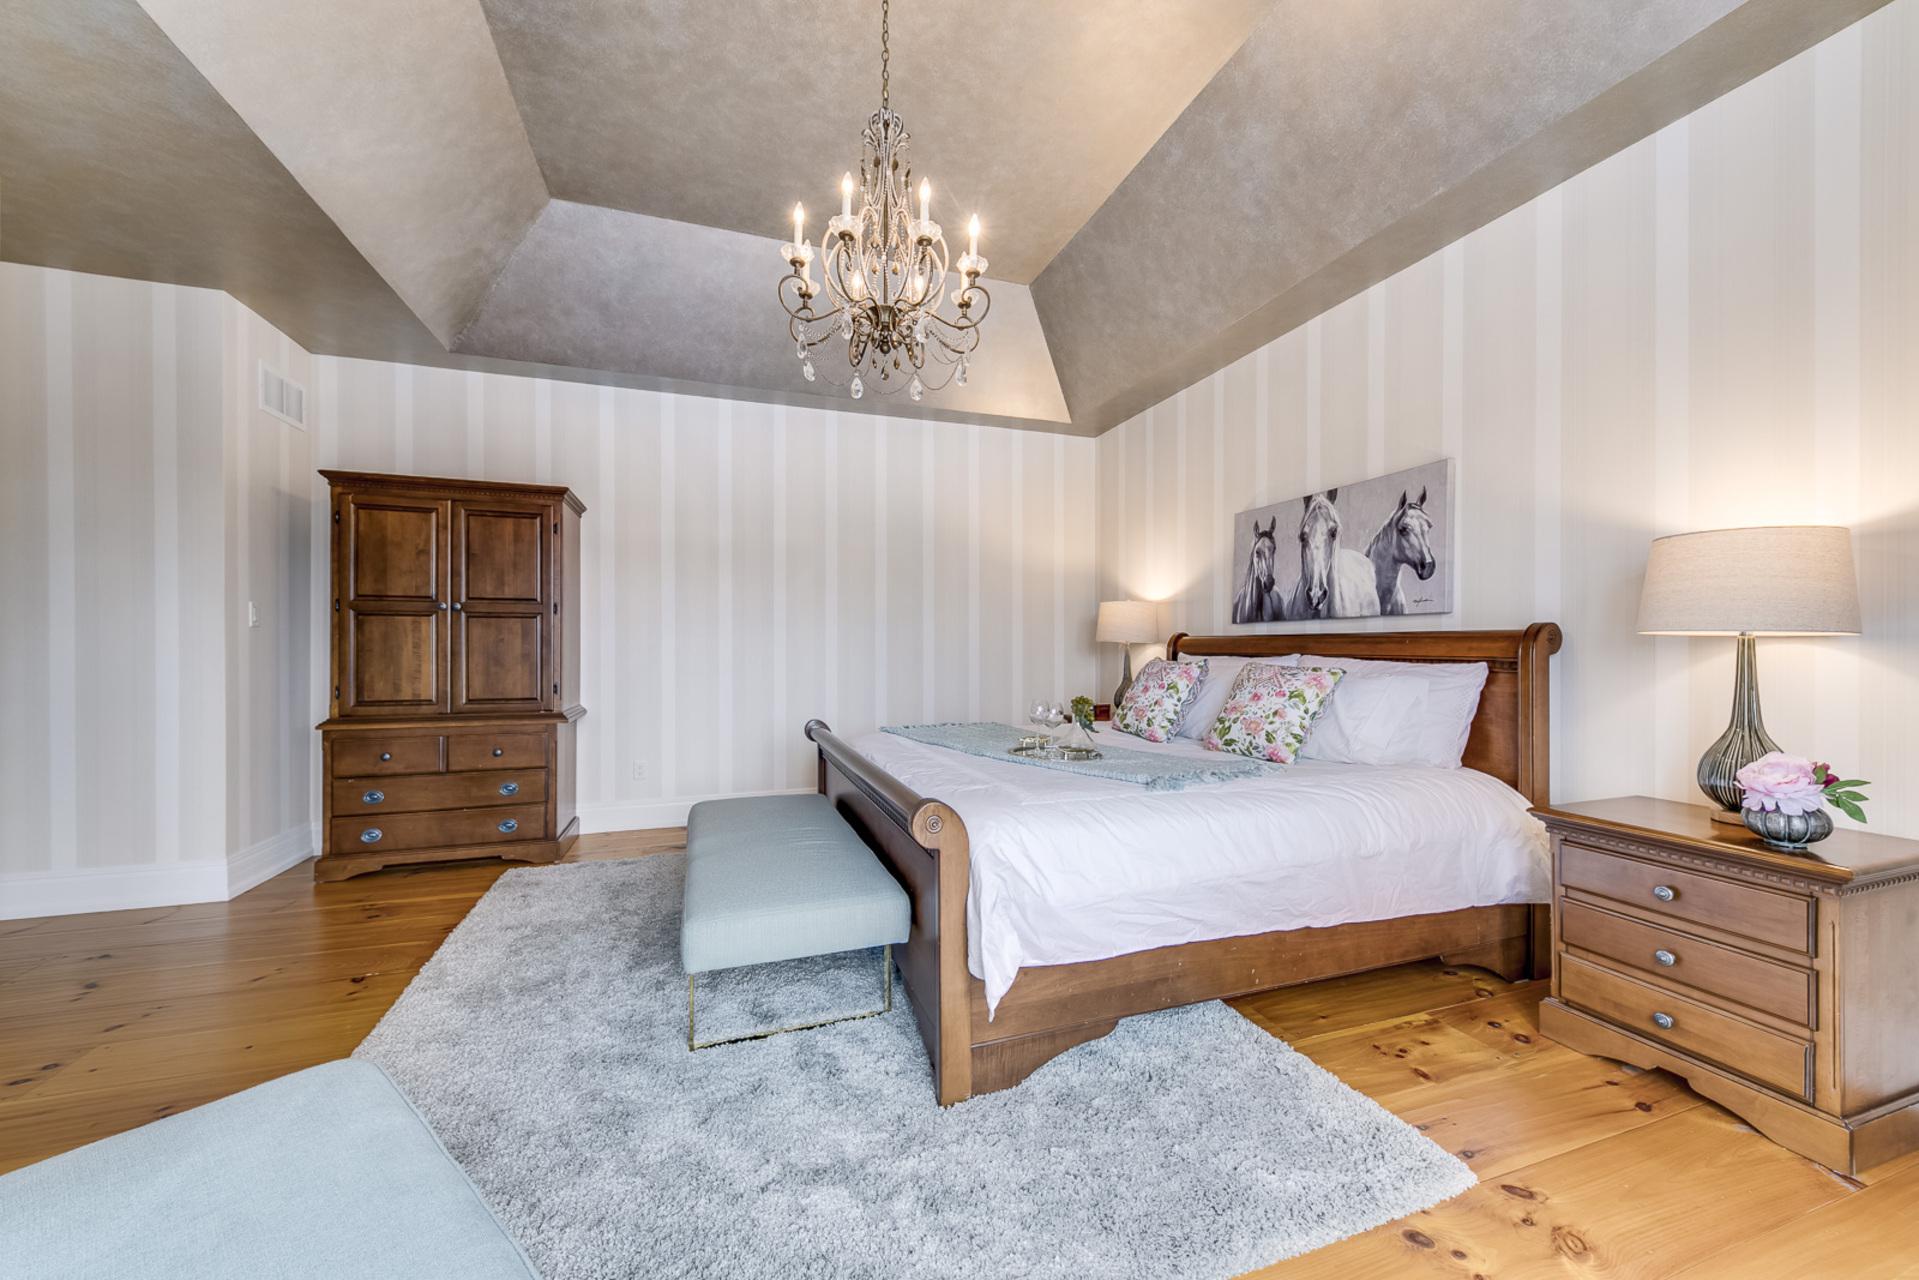 Master Bedroom - 725 Queensway W, Mississauga - Elite3 & Team at 725 Queensway West, Erindale, Mississauga